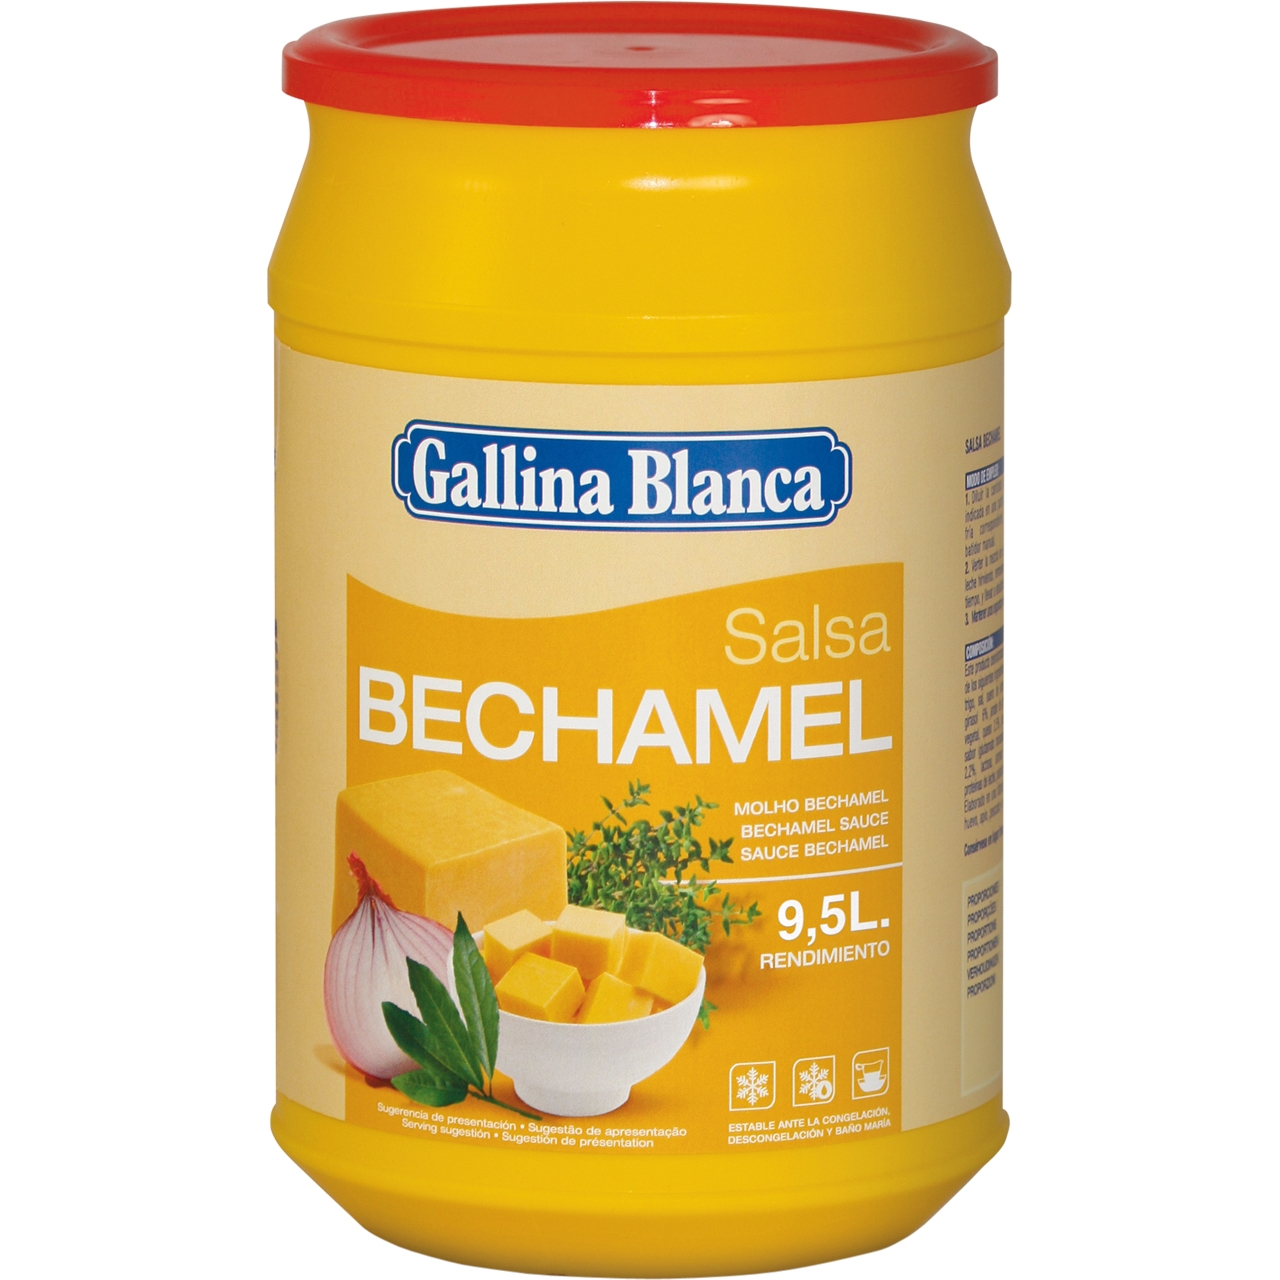 Salsa bechamel deshidratada 1kg. Gallina Blanca